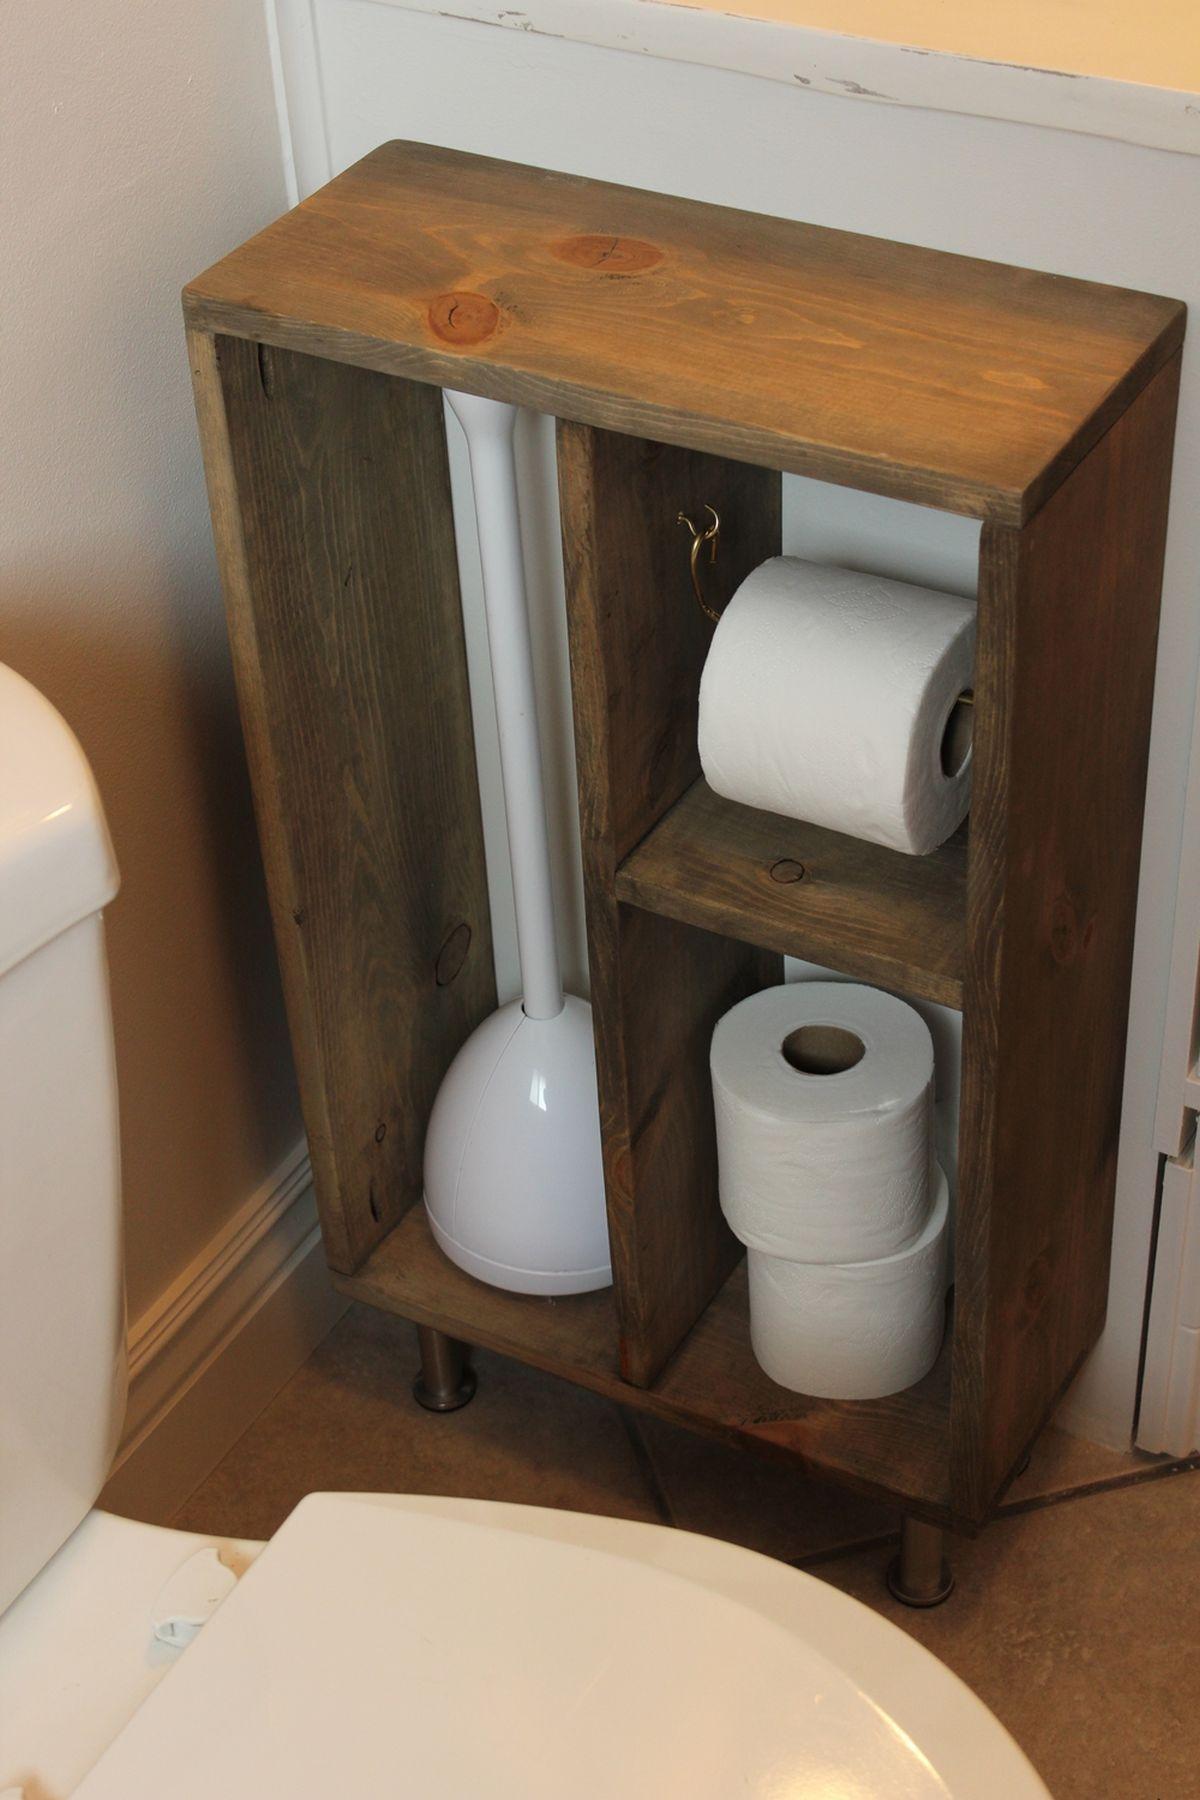 Diy Simple Brass Toilet Paper Holder Diy Toilet Paper Holder Toilet Paper Holder Stand Toilet Paper Storage